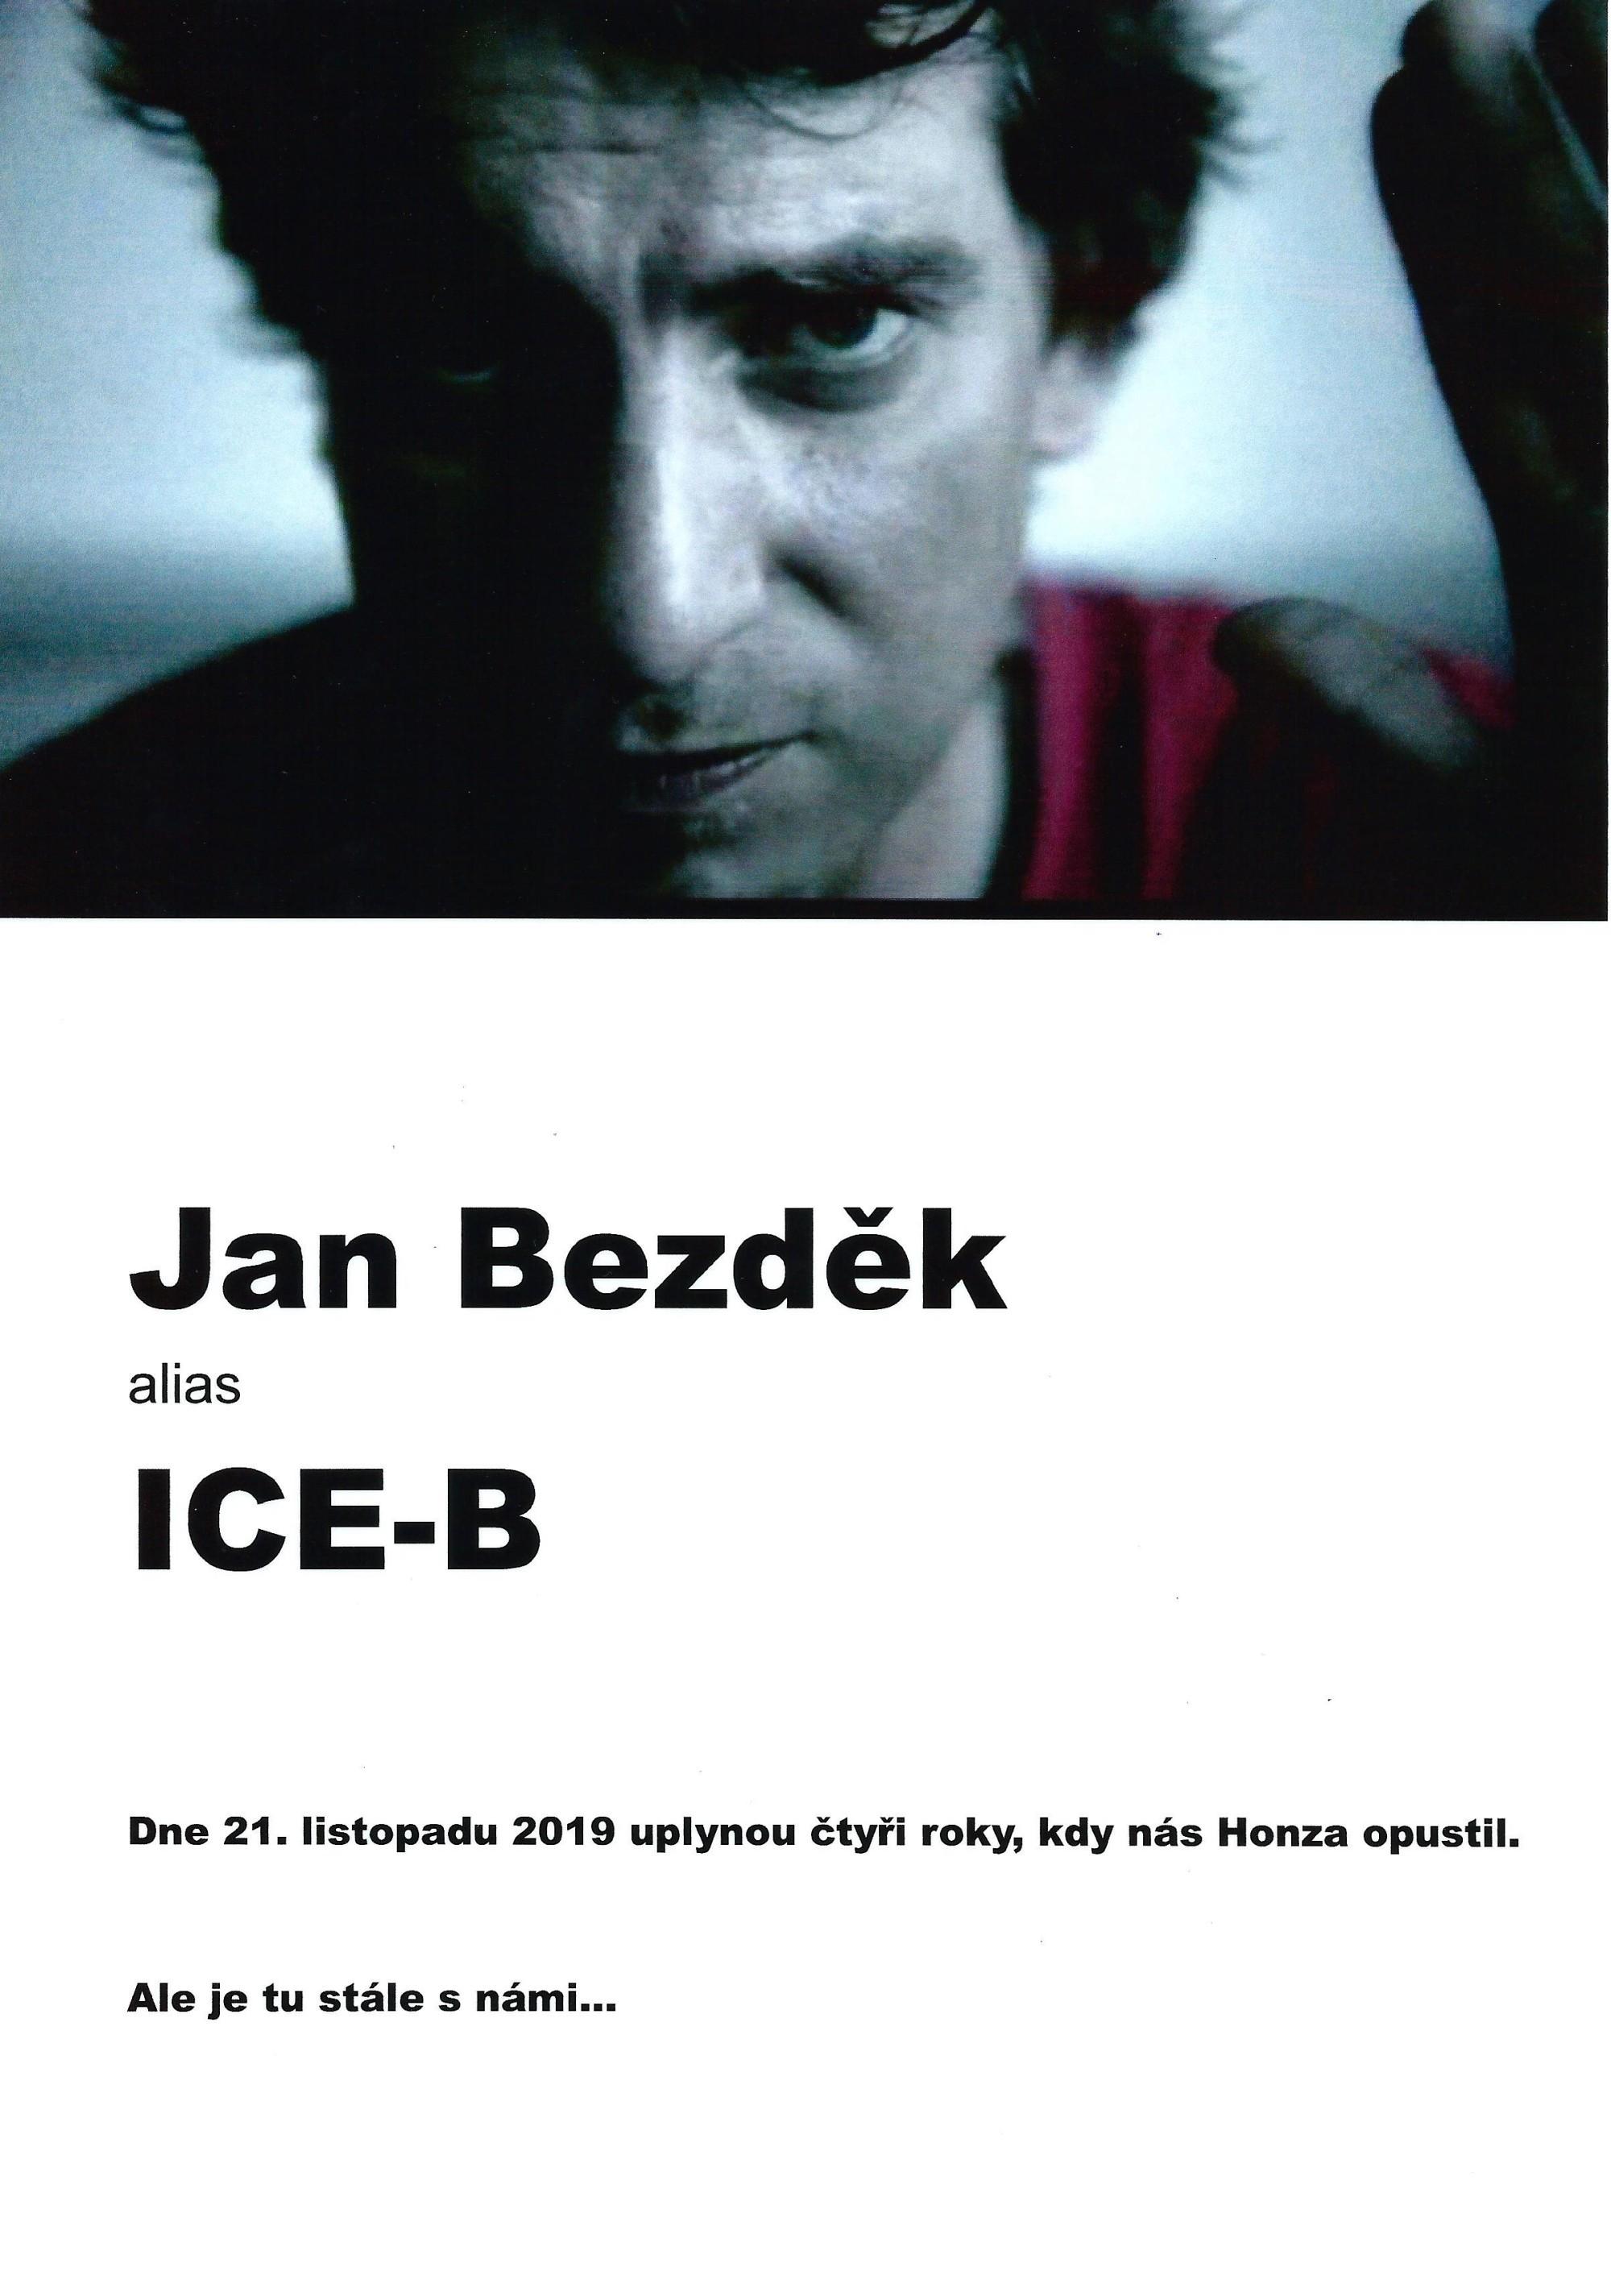 Jan Bezděk alias ICE-B